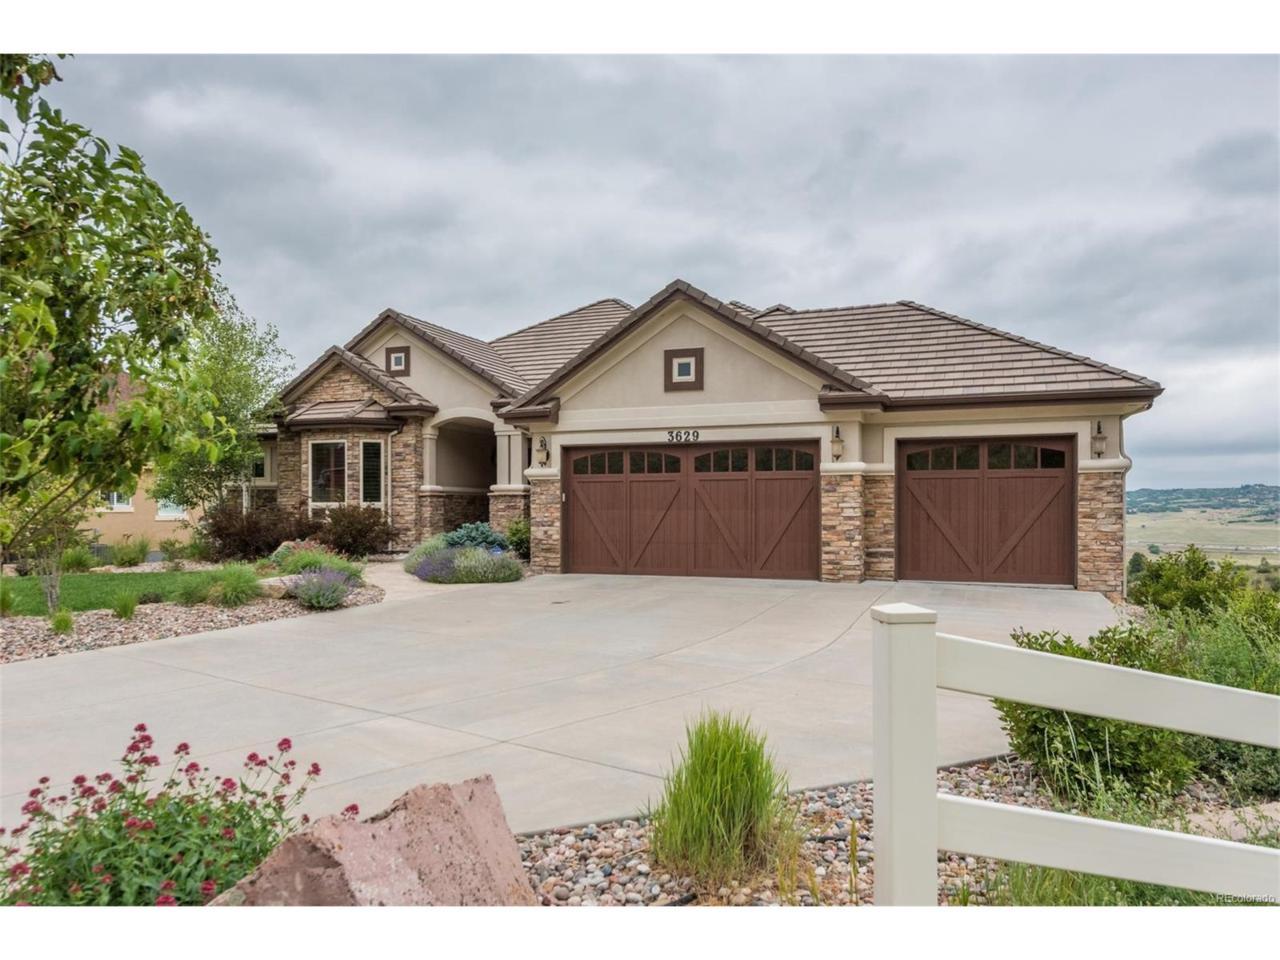 3629 Eveningglow Way, Castle Rock, CO 80104 (MLS #9740160) :: 8z Real Estate